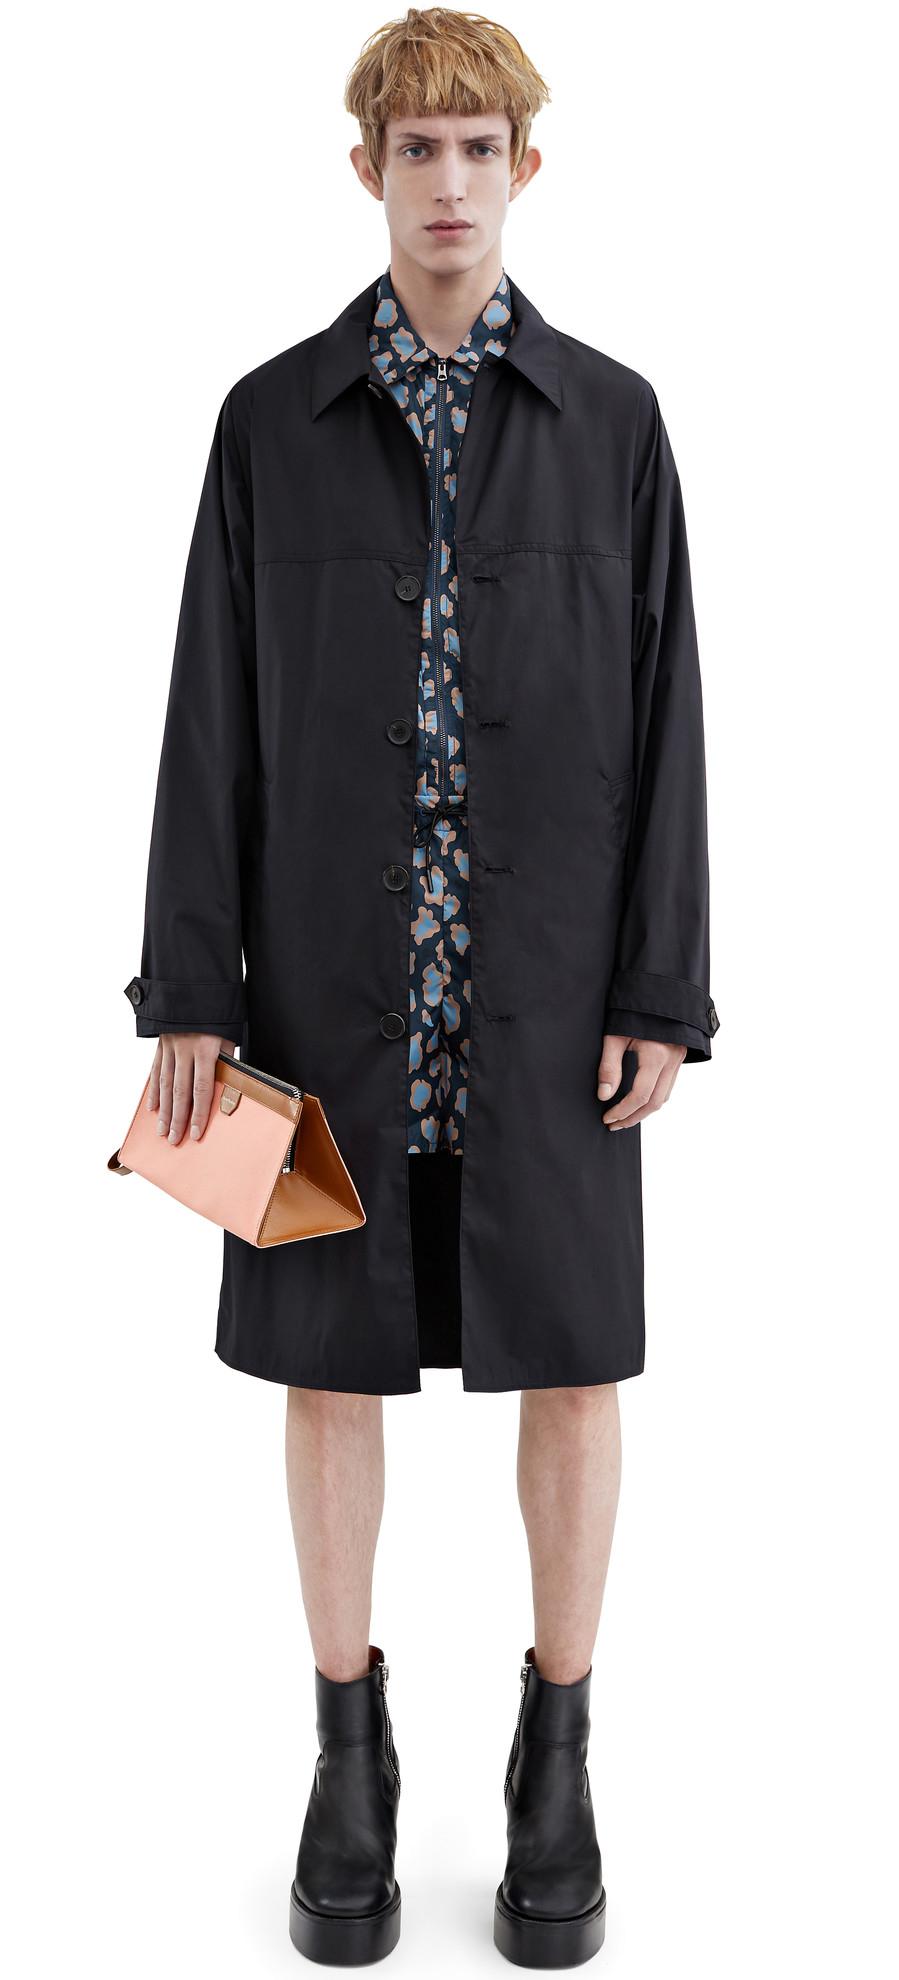 black single men in milo Single layer with chest pocket 100% rayon home / black friday sale 2017 / milo - bubblegum charcoal milo.